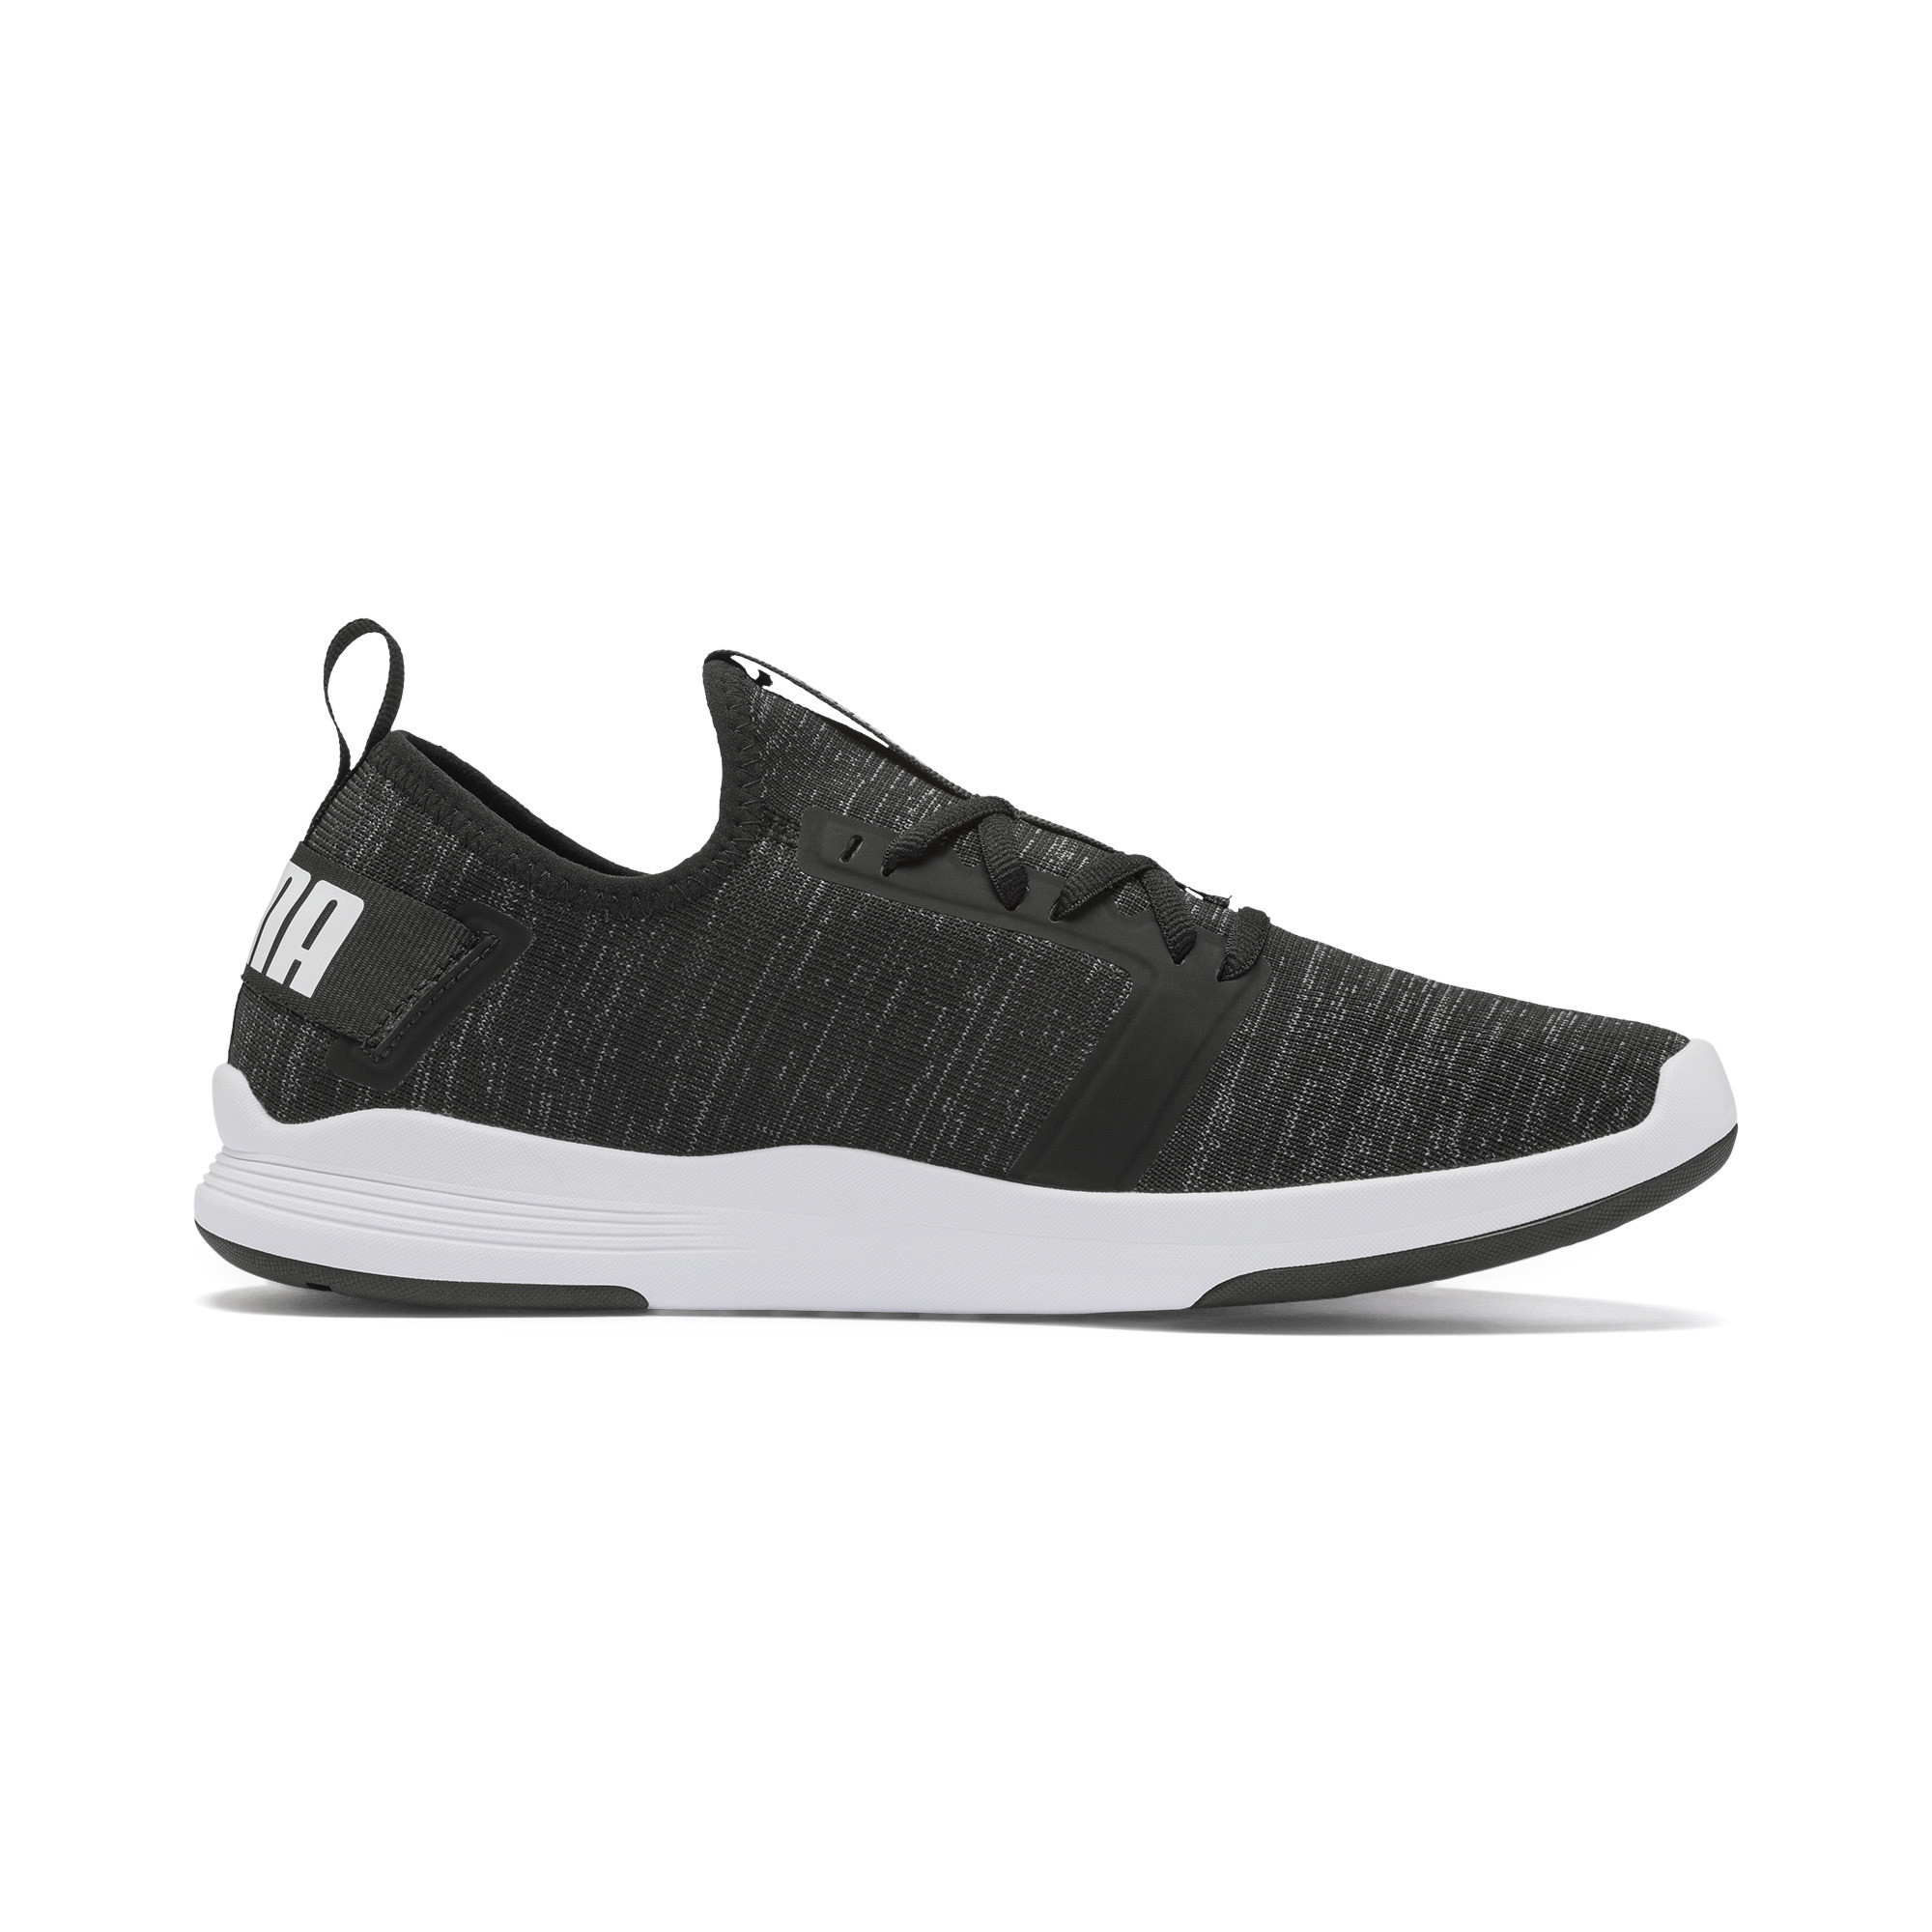 PUMA-Men-039-s-IGNITE-Contender-Knit-Running-Shoes thumbnail 12